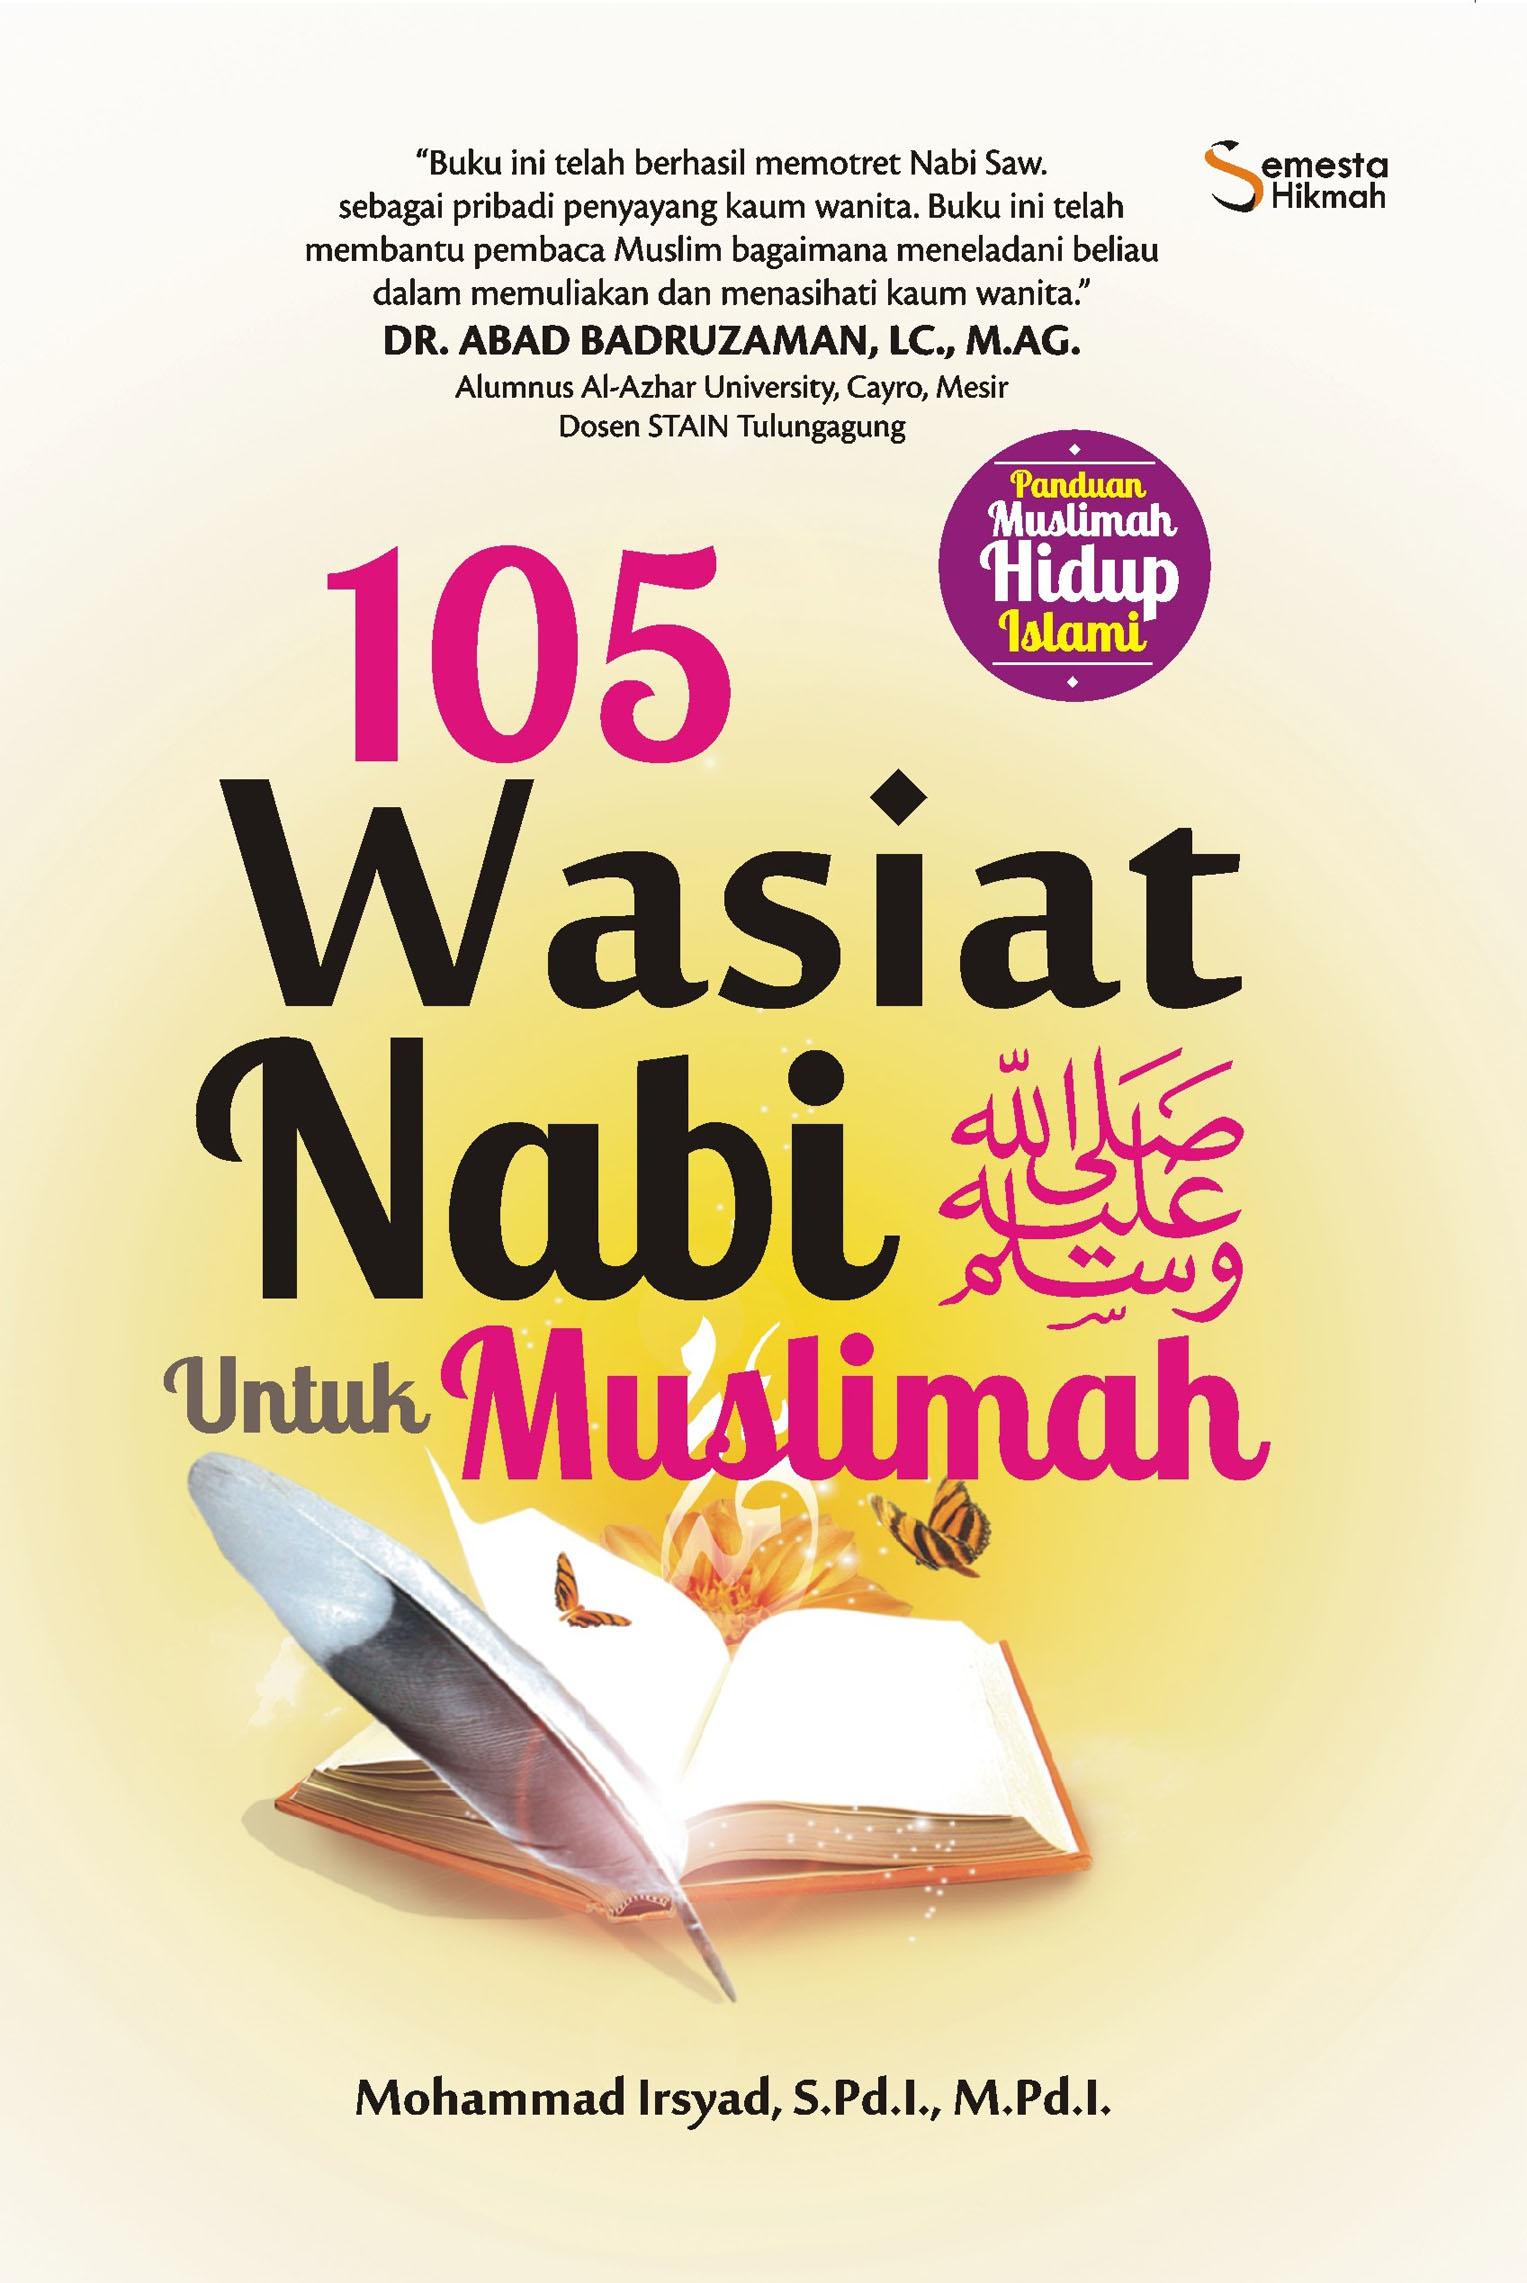 105 WASIAT NABI SAW UNTUK MUSLIMAHen